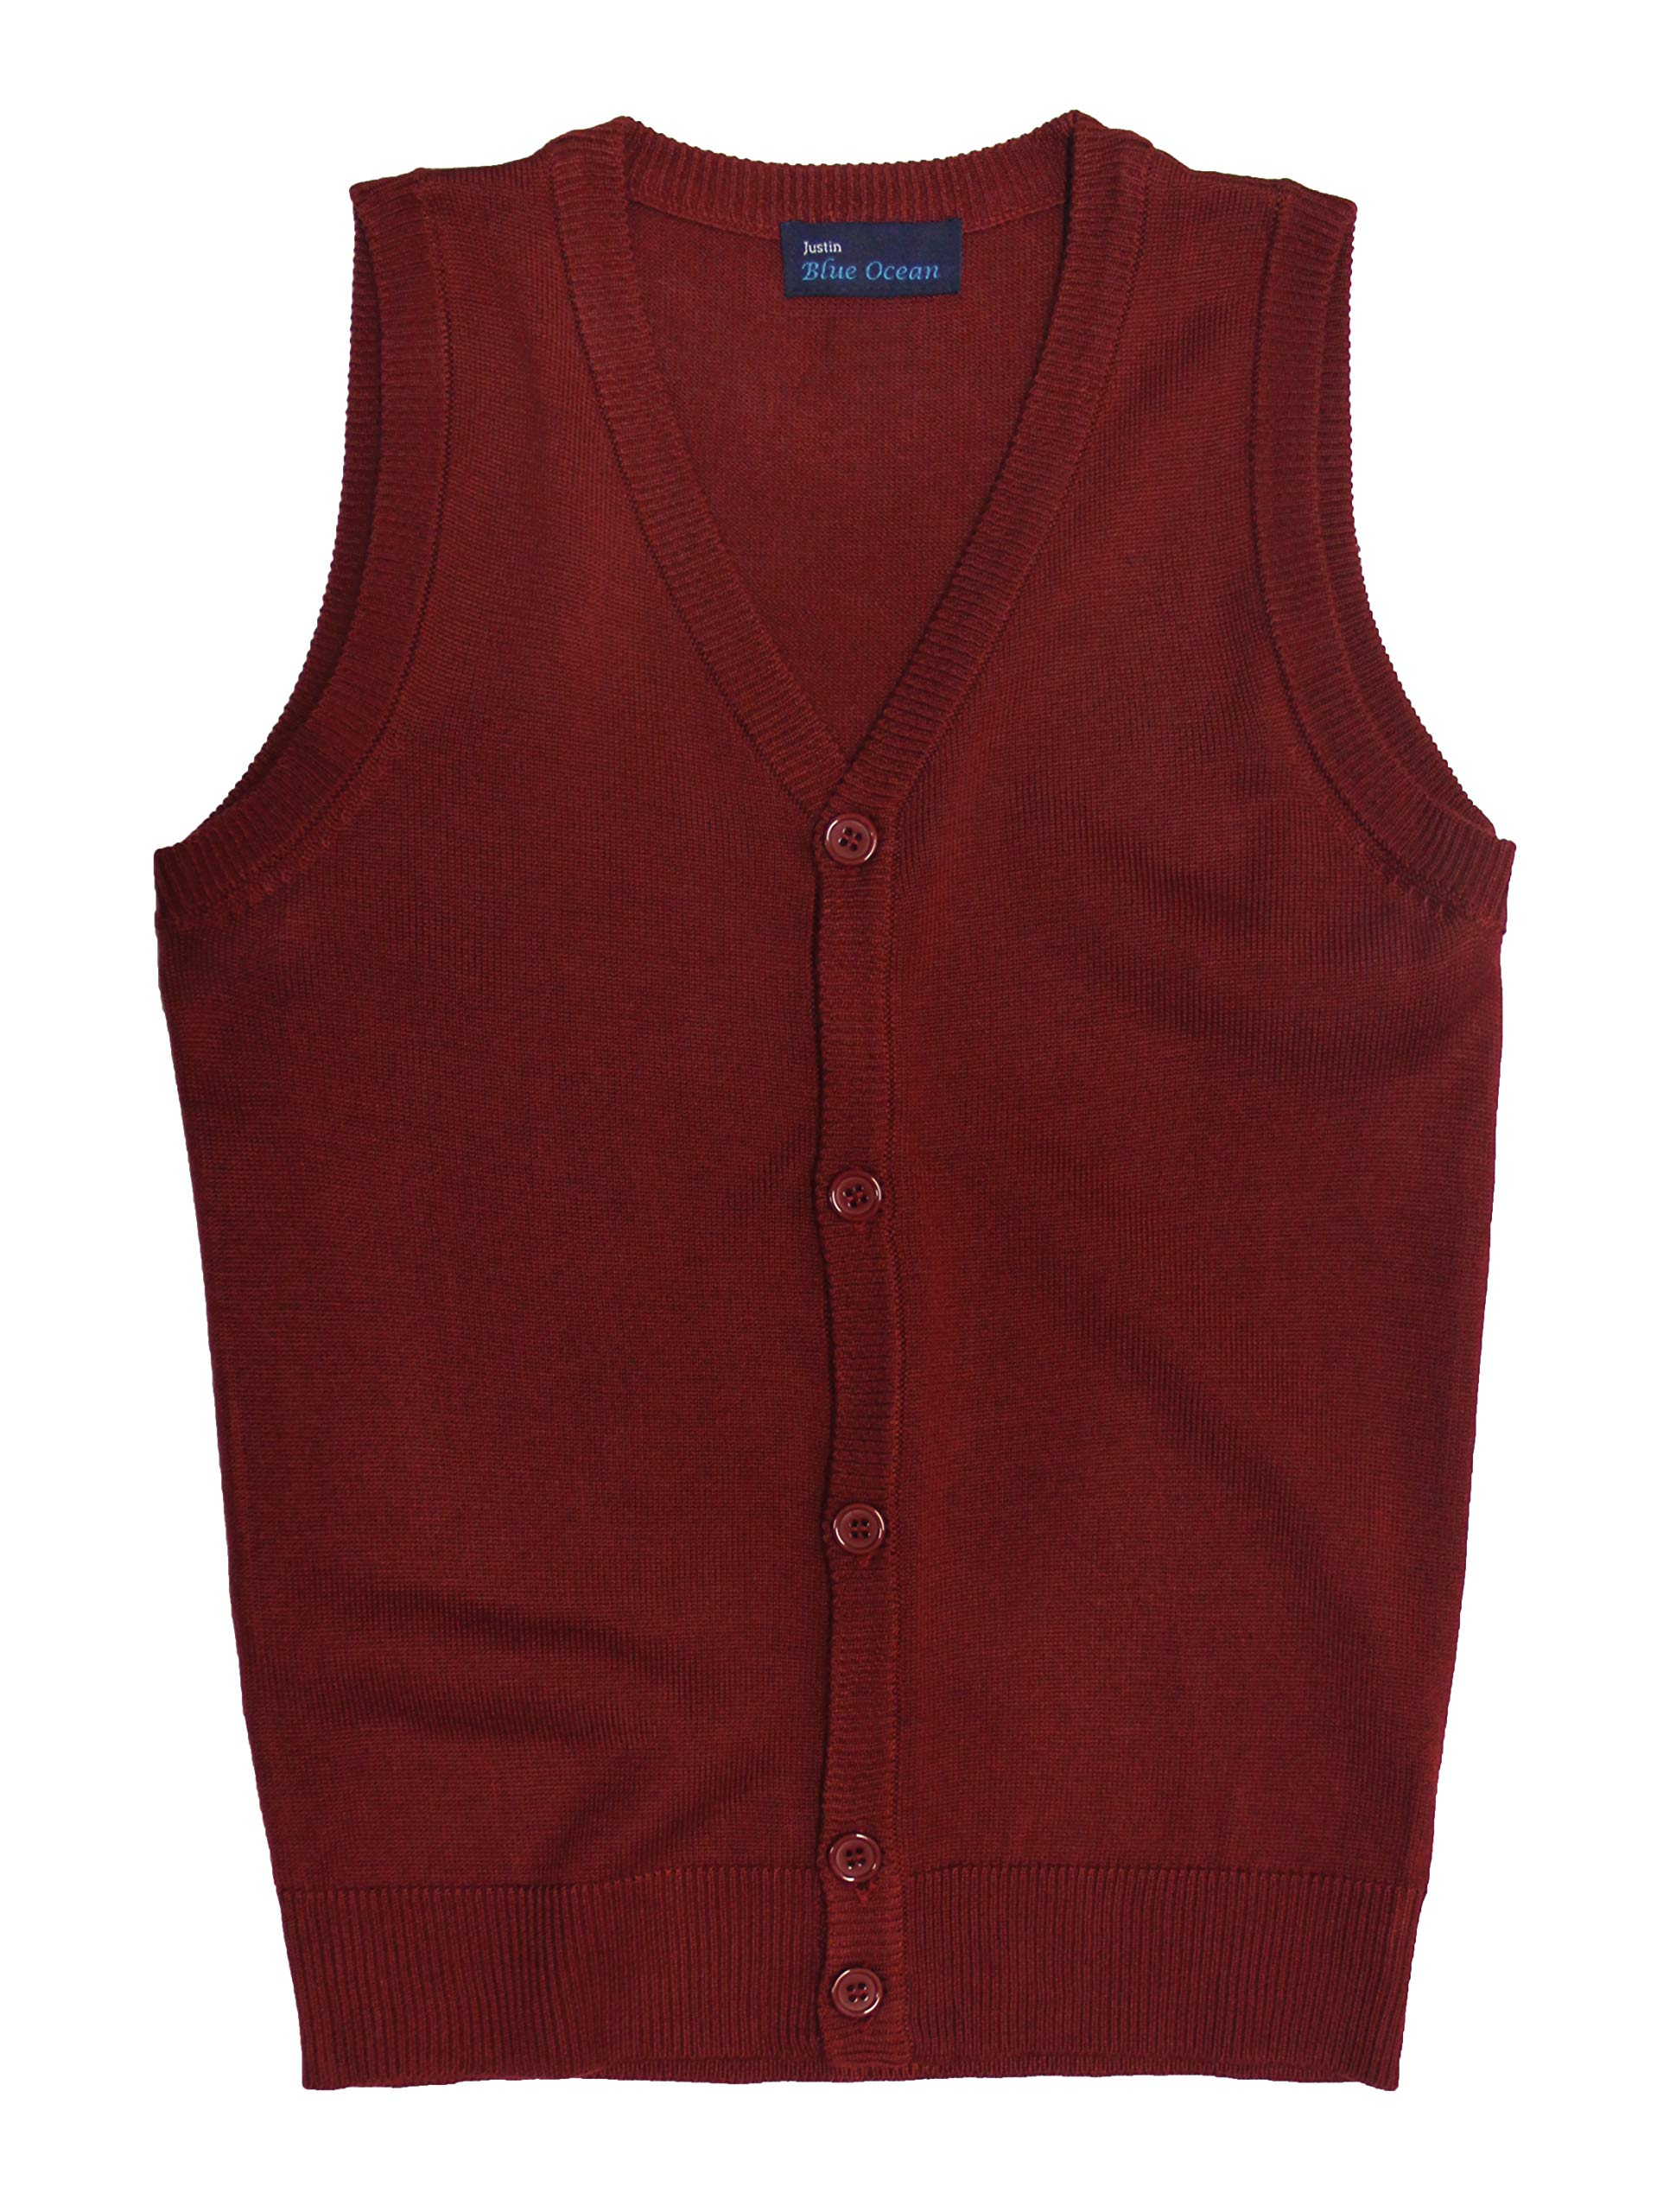 Blue Ocean Kids Cardigan Sweater Vest-8-10/Small